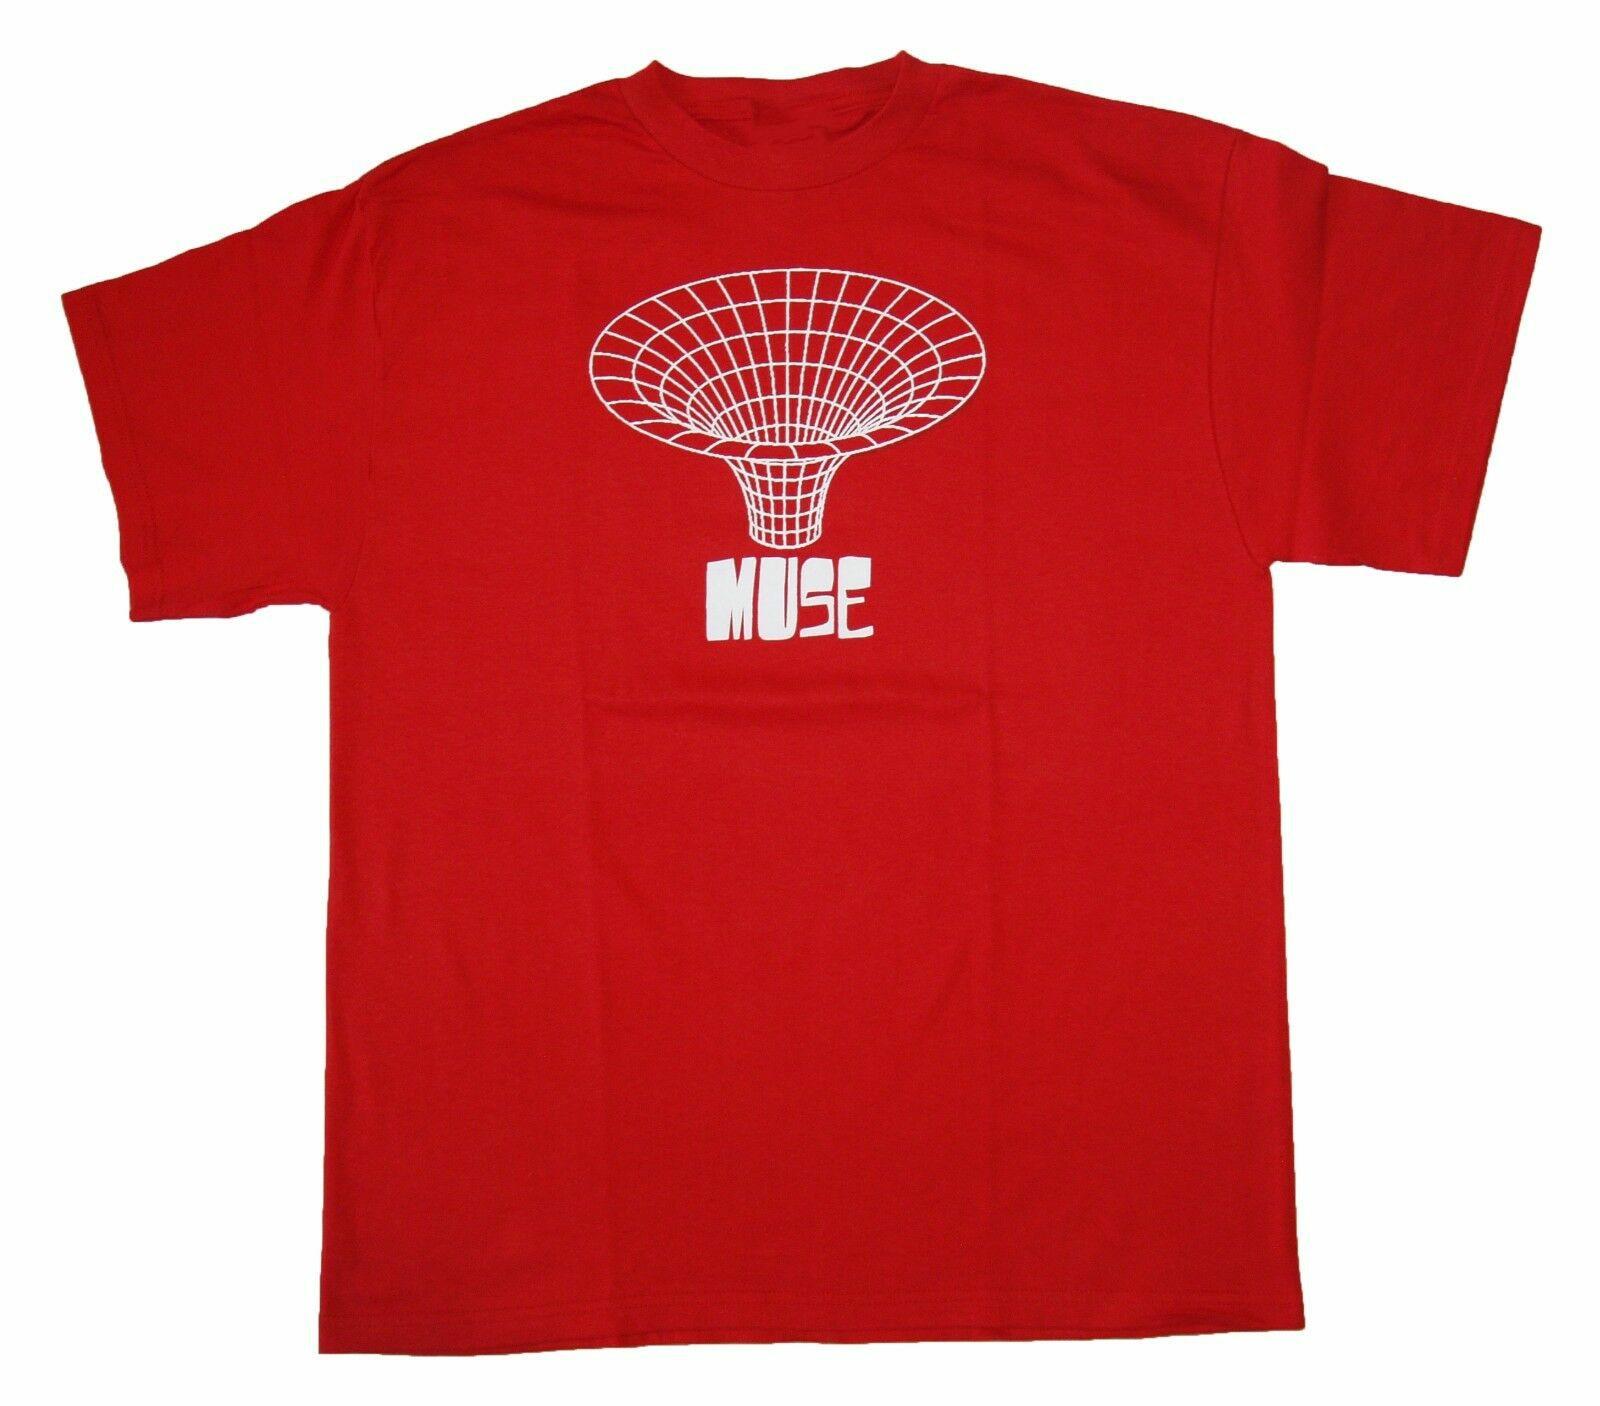 Muse-drawn em-camisa oficial t S-M-L-XL novo-camisa oficial t